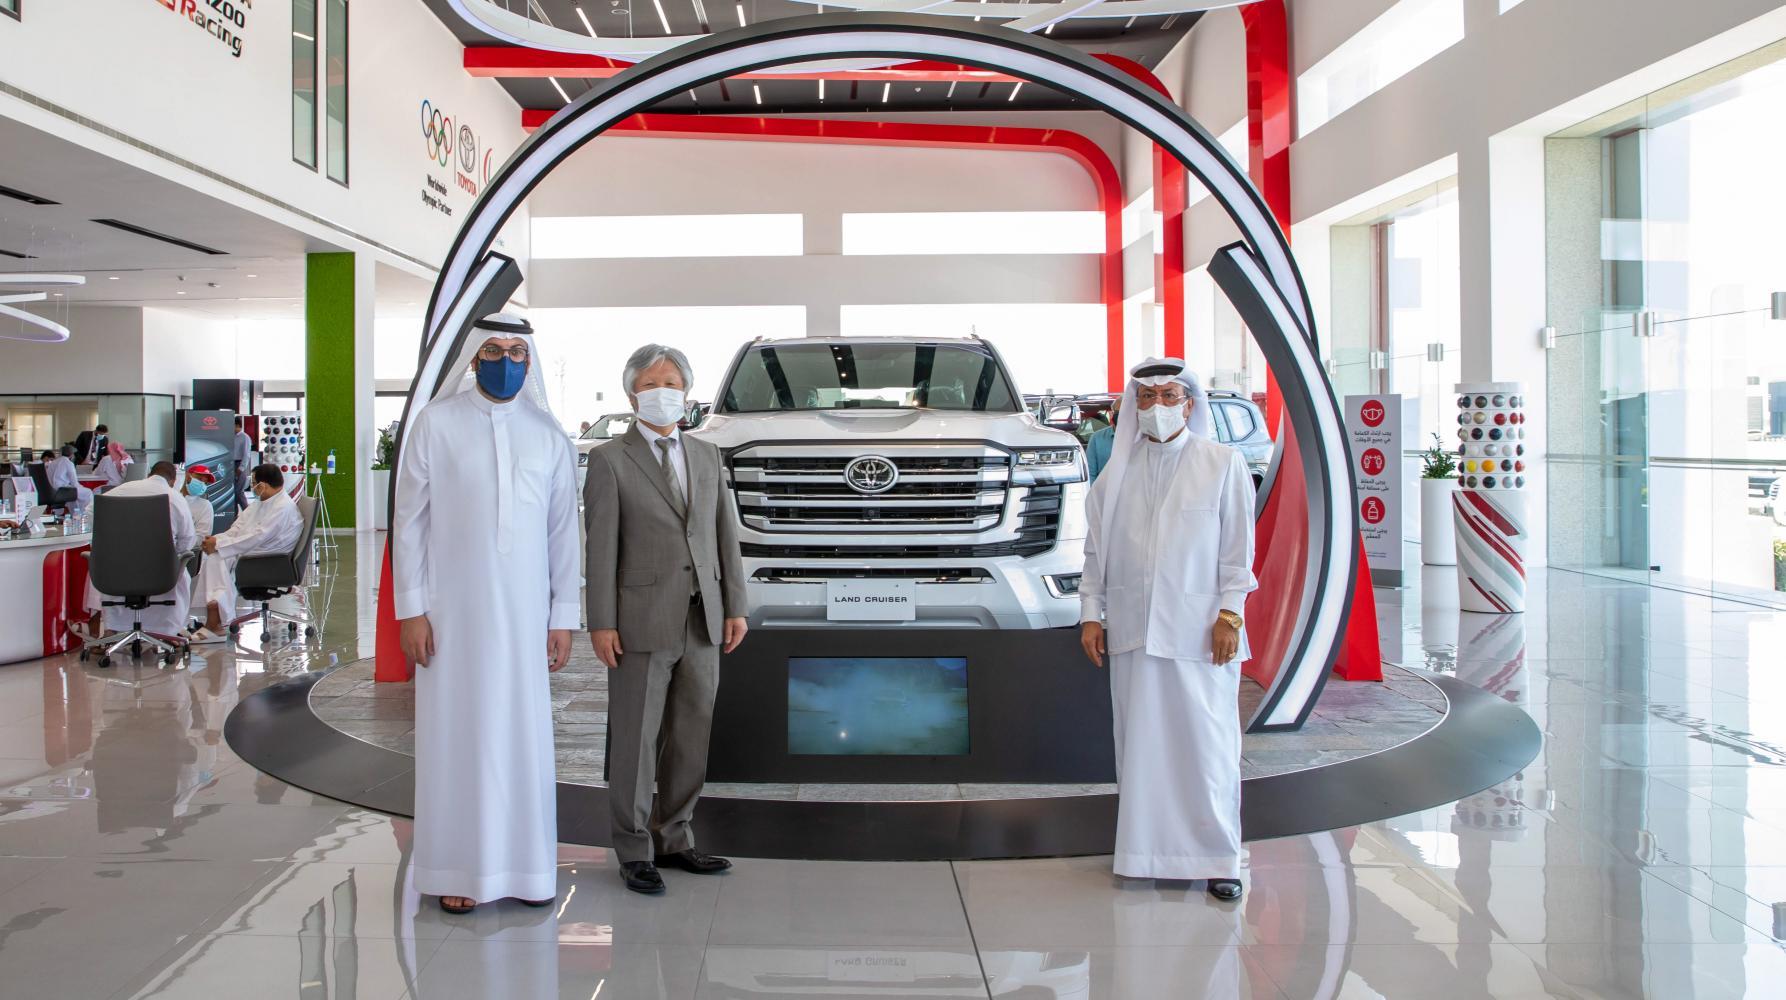 Ebrahim Khalil Kanoo Launches All-New Toyota Land Cruiser